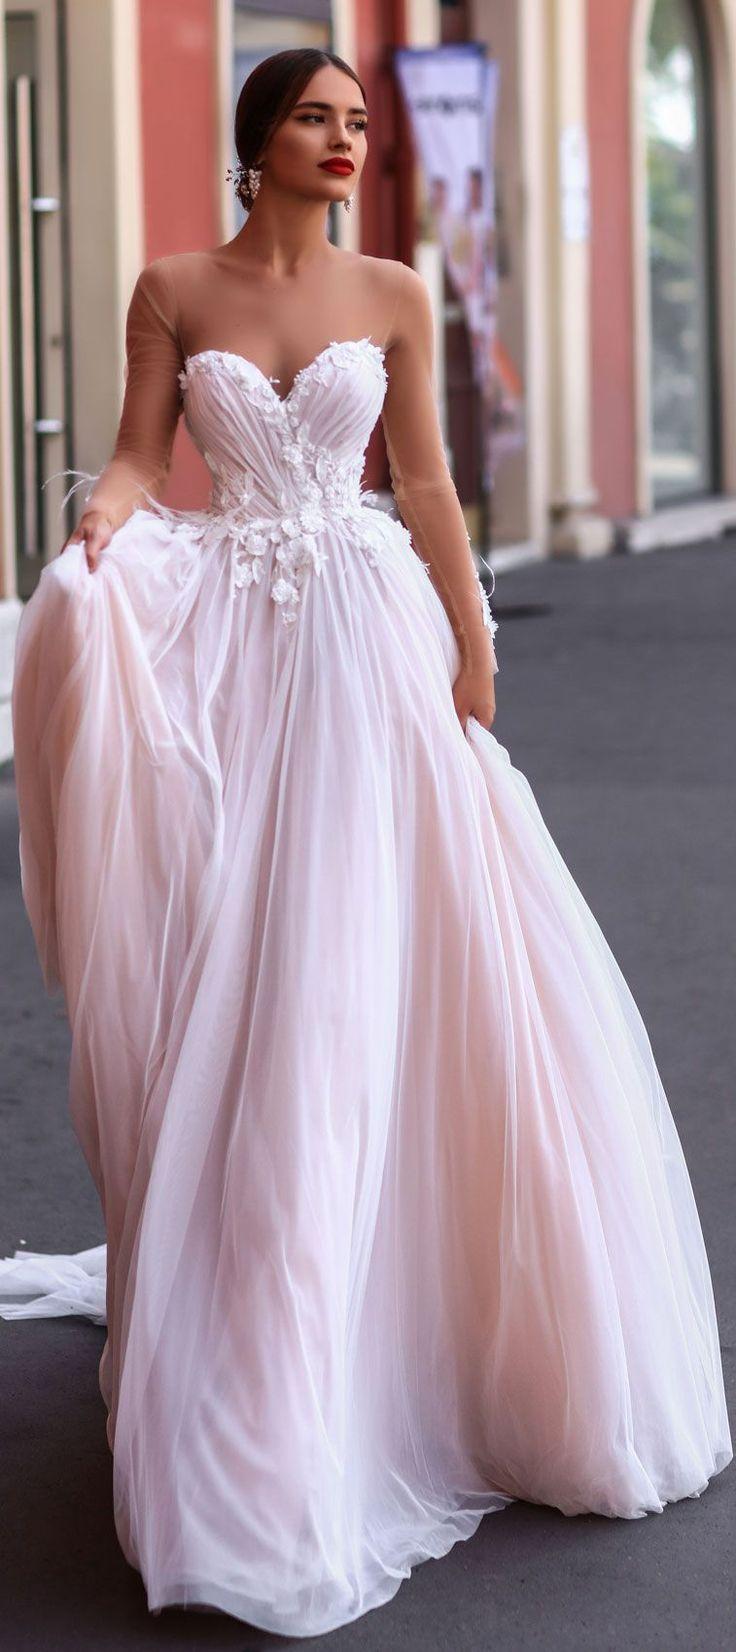 Katherine Joyce 2018 Wedding Dresses illusion long sleeve sweetheart a line wedding gown